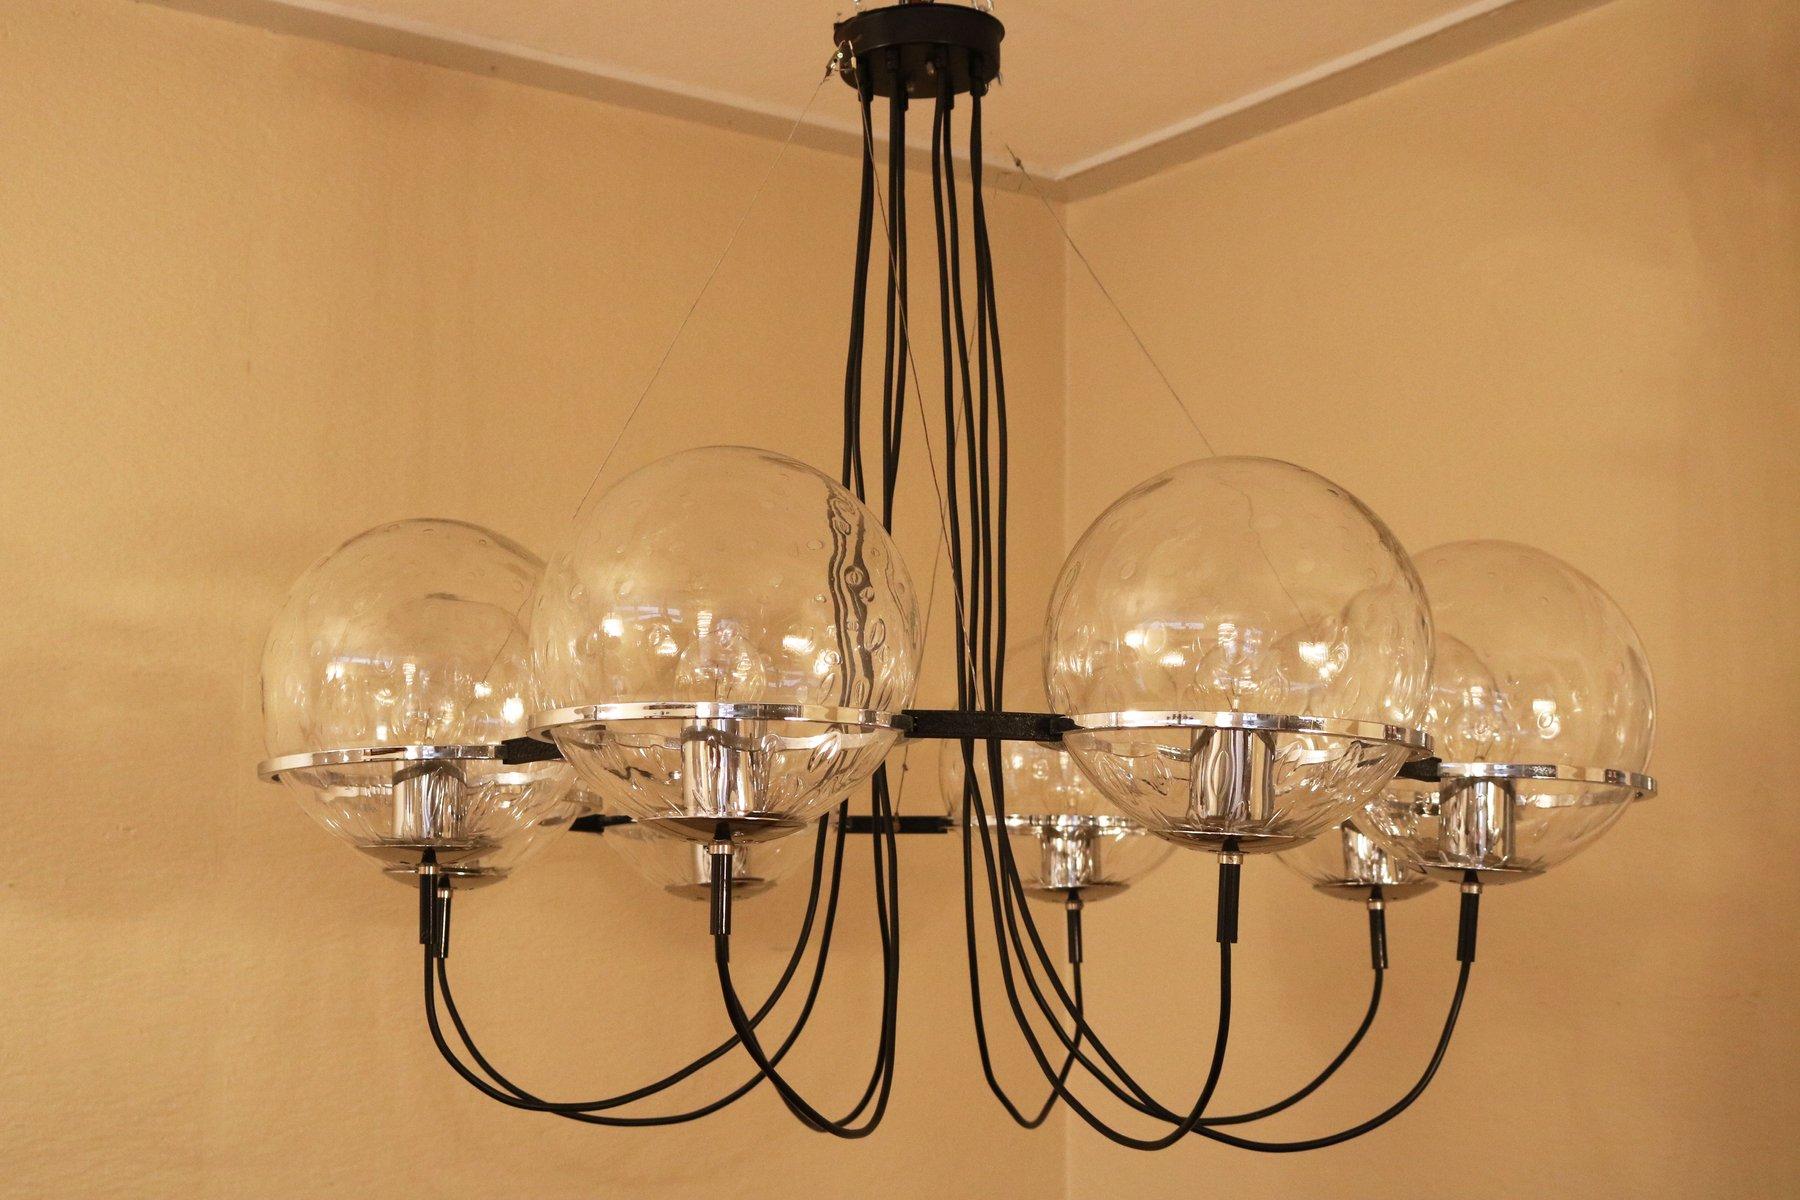 tonone chandelier id webshop orange collection bolt back